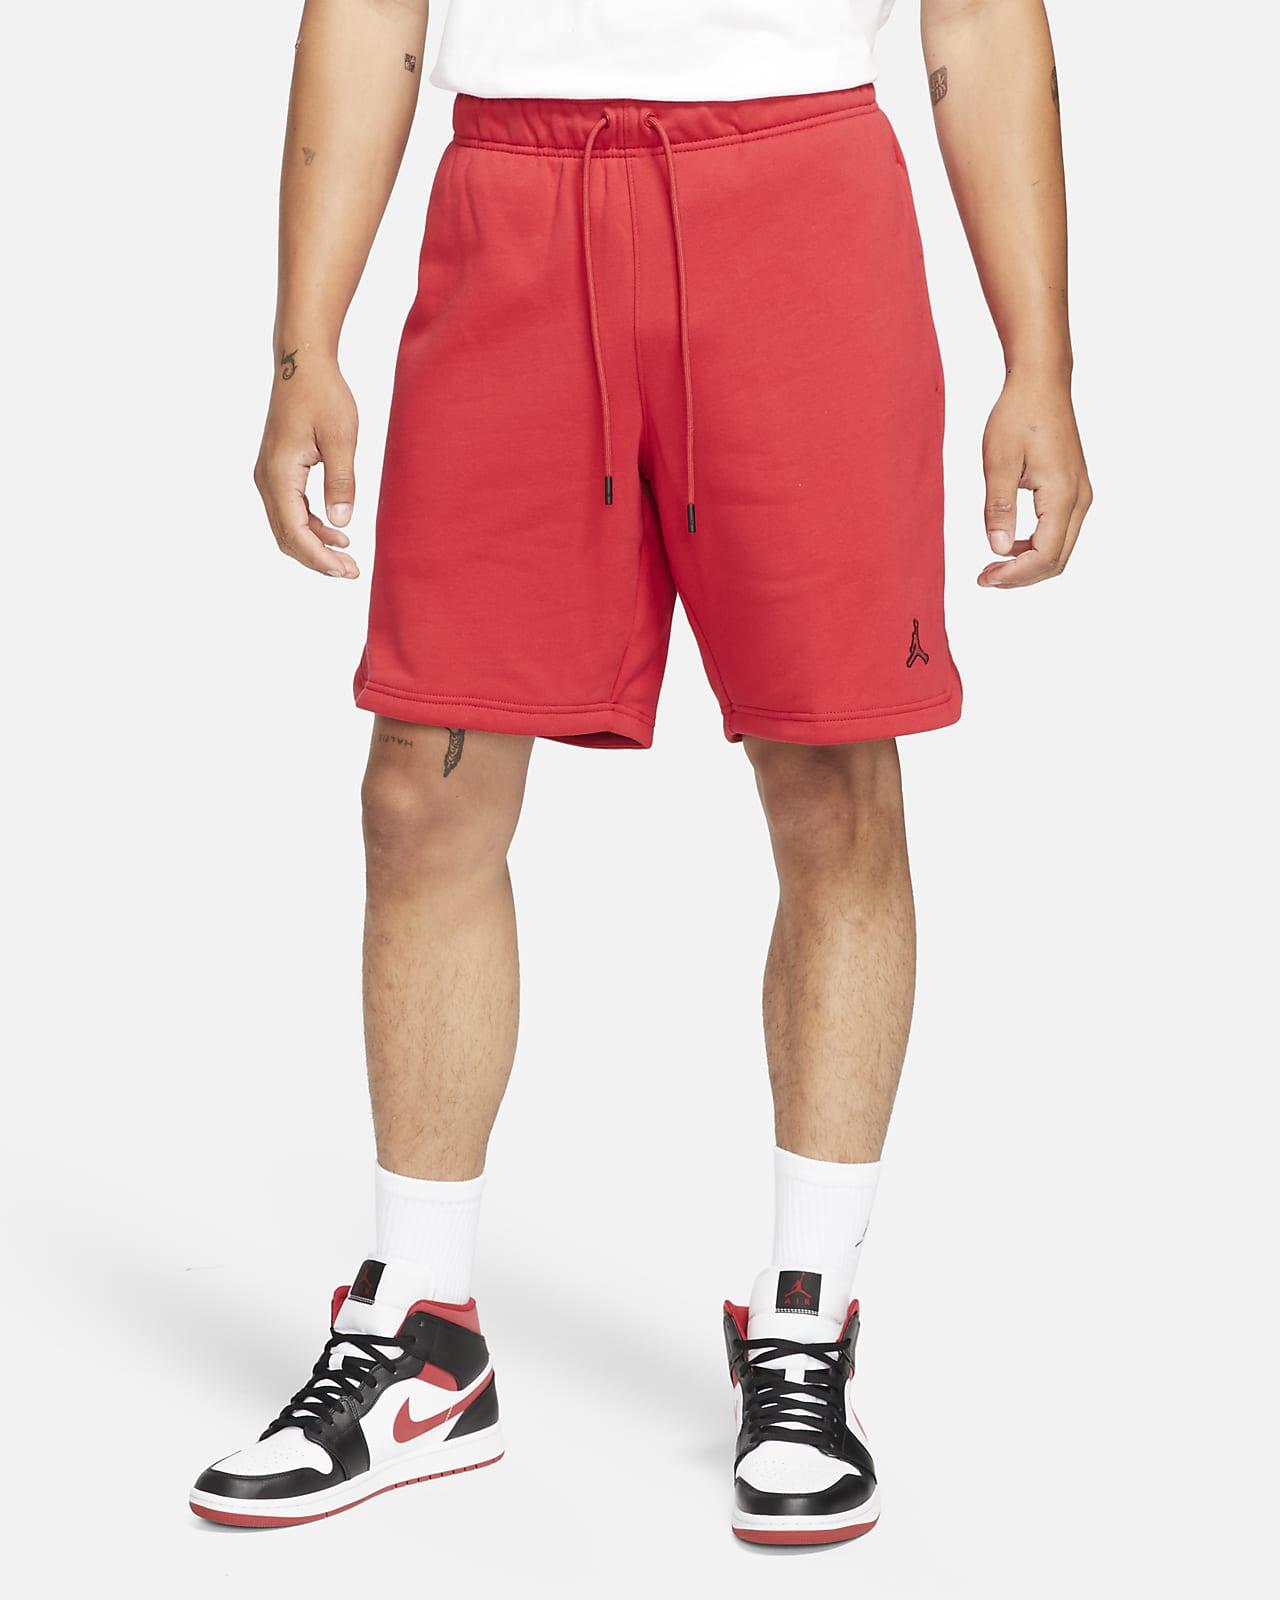 Jordan Essentials Men's Fleece Shorts